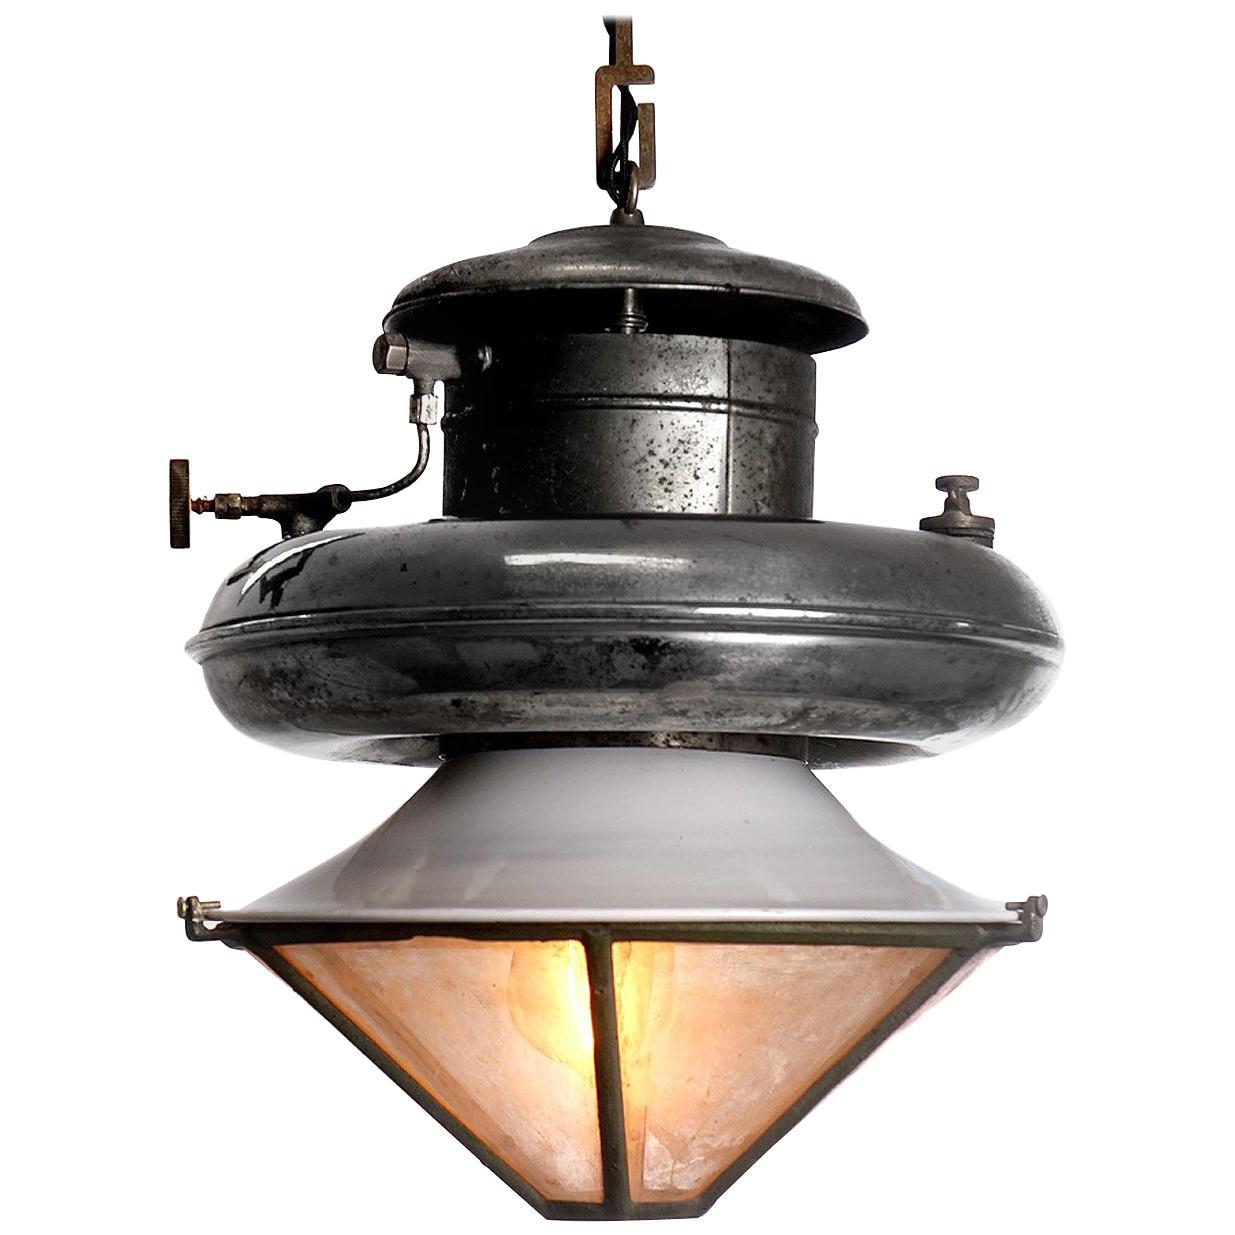 Rare American Gas Machine #777 Circus Lamp